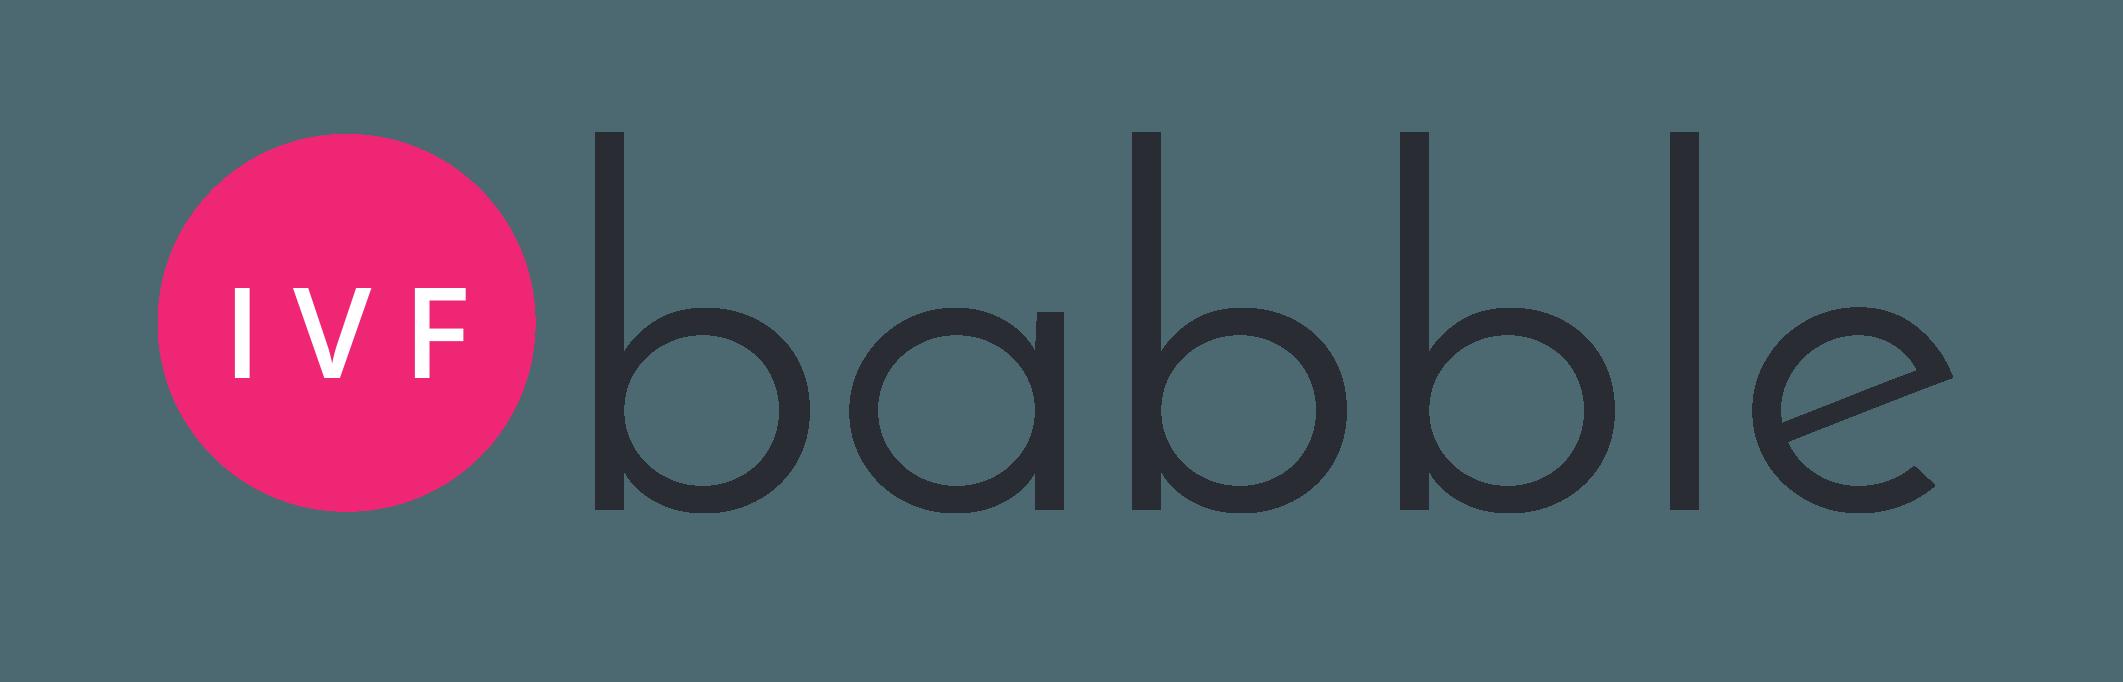 IVF BABBLE